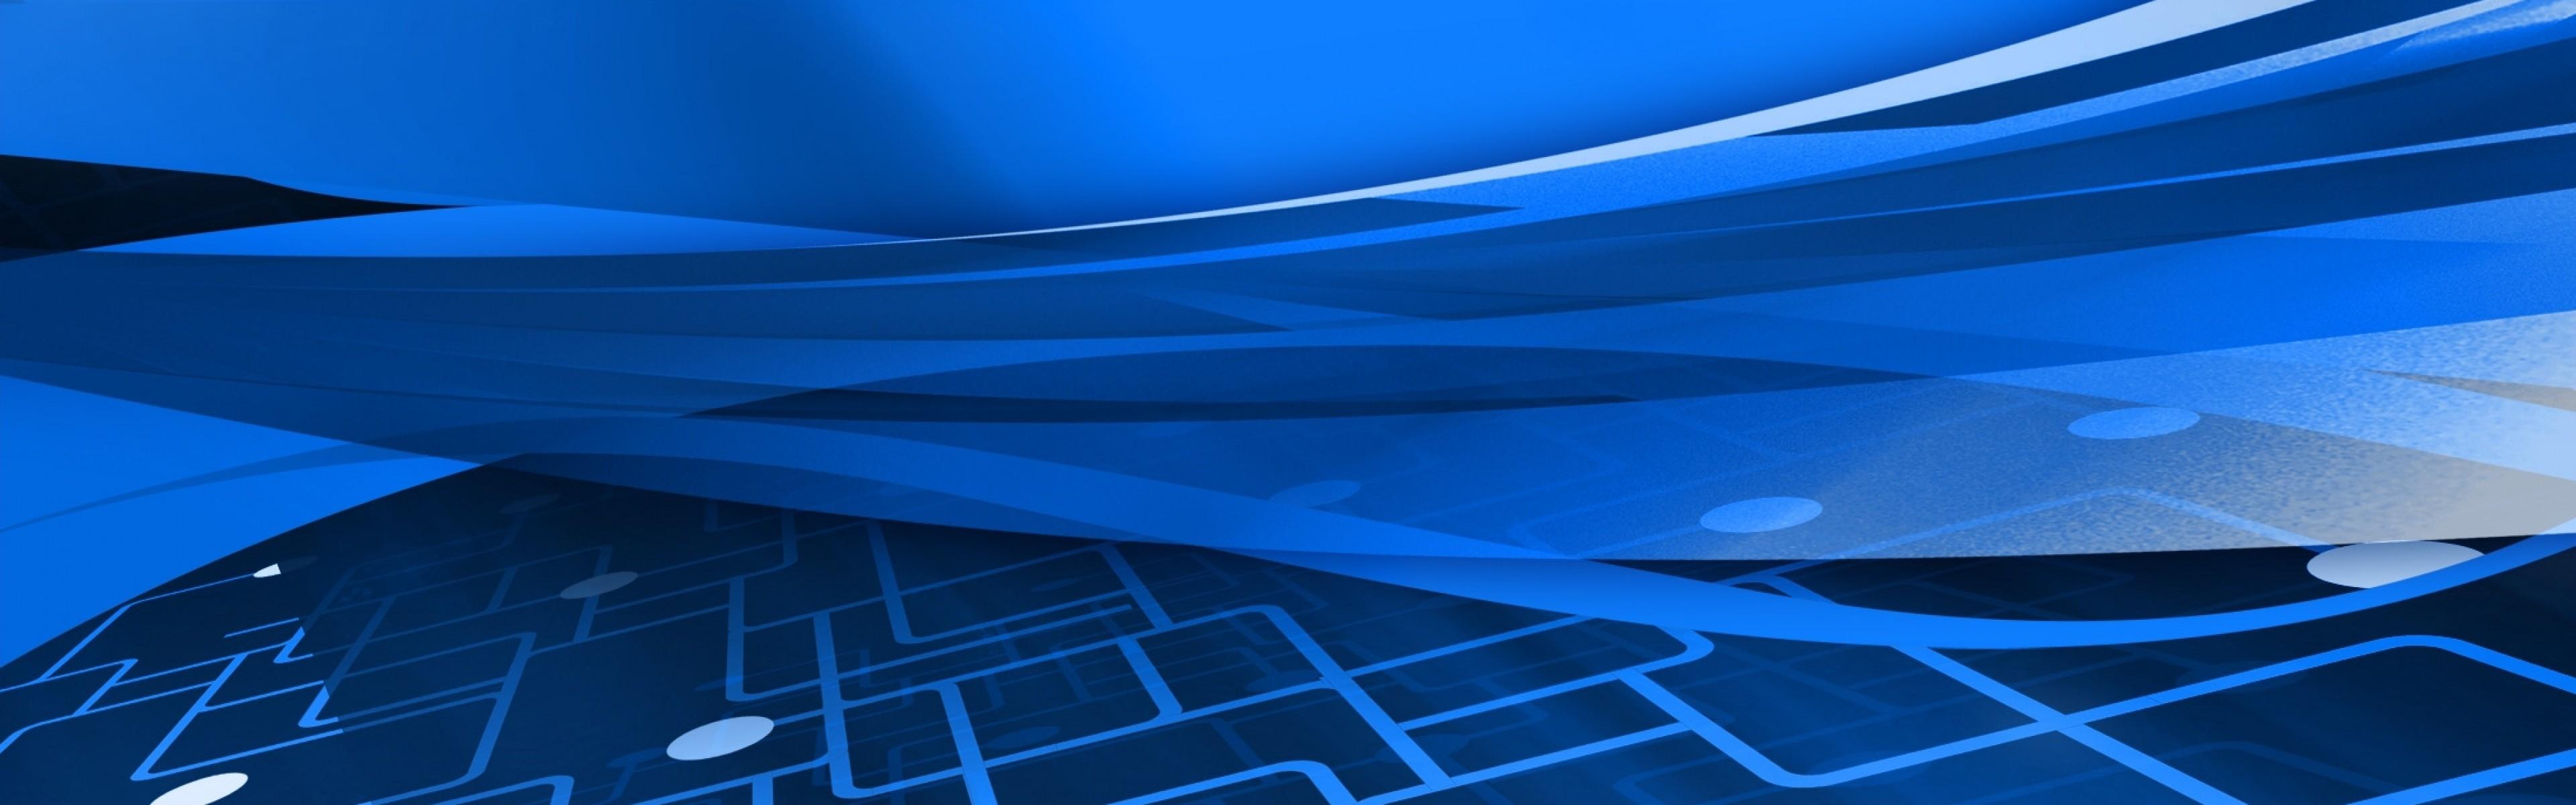 thin blue line wallpaper – Google Search | Blue Lives | Pinterest .